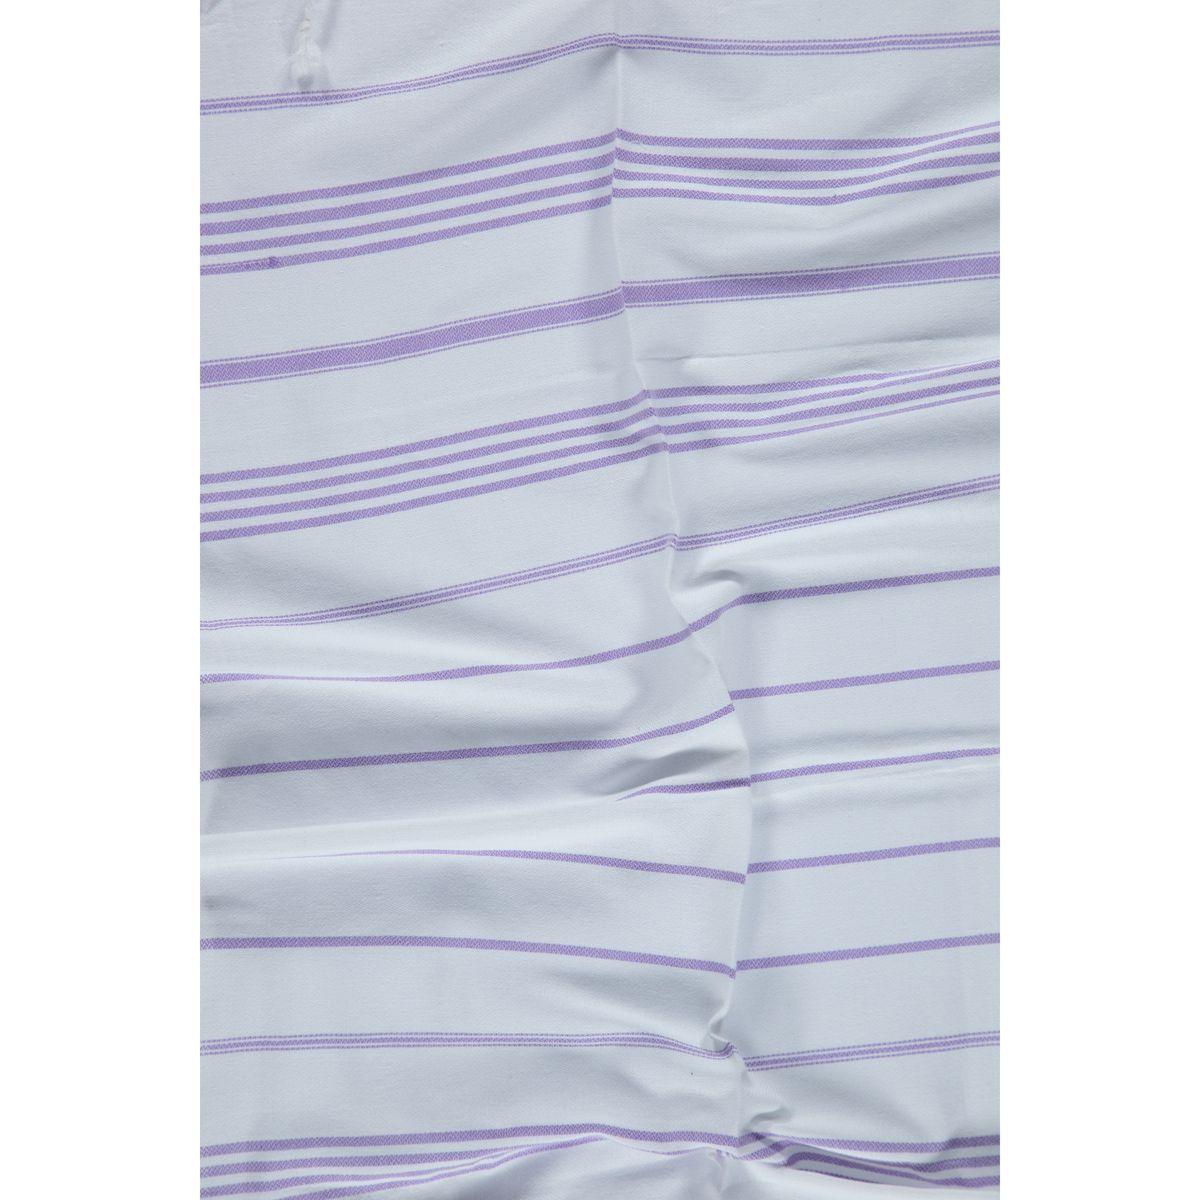 Peshkir Leyla / Dark Lilac Stripes